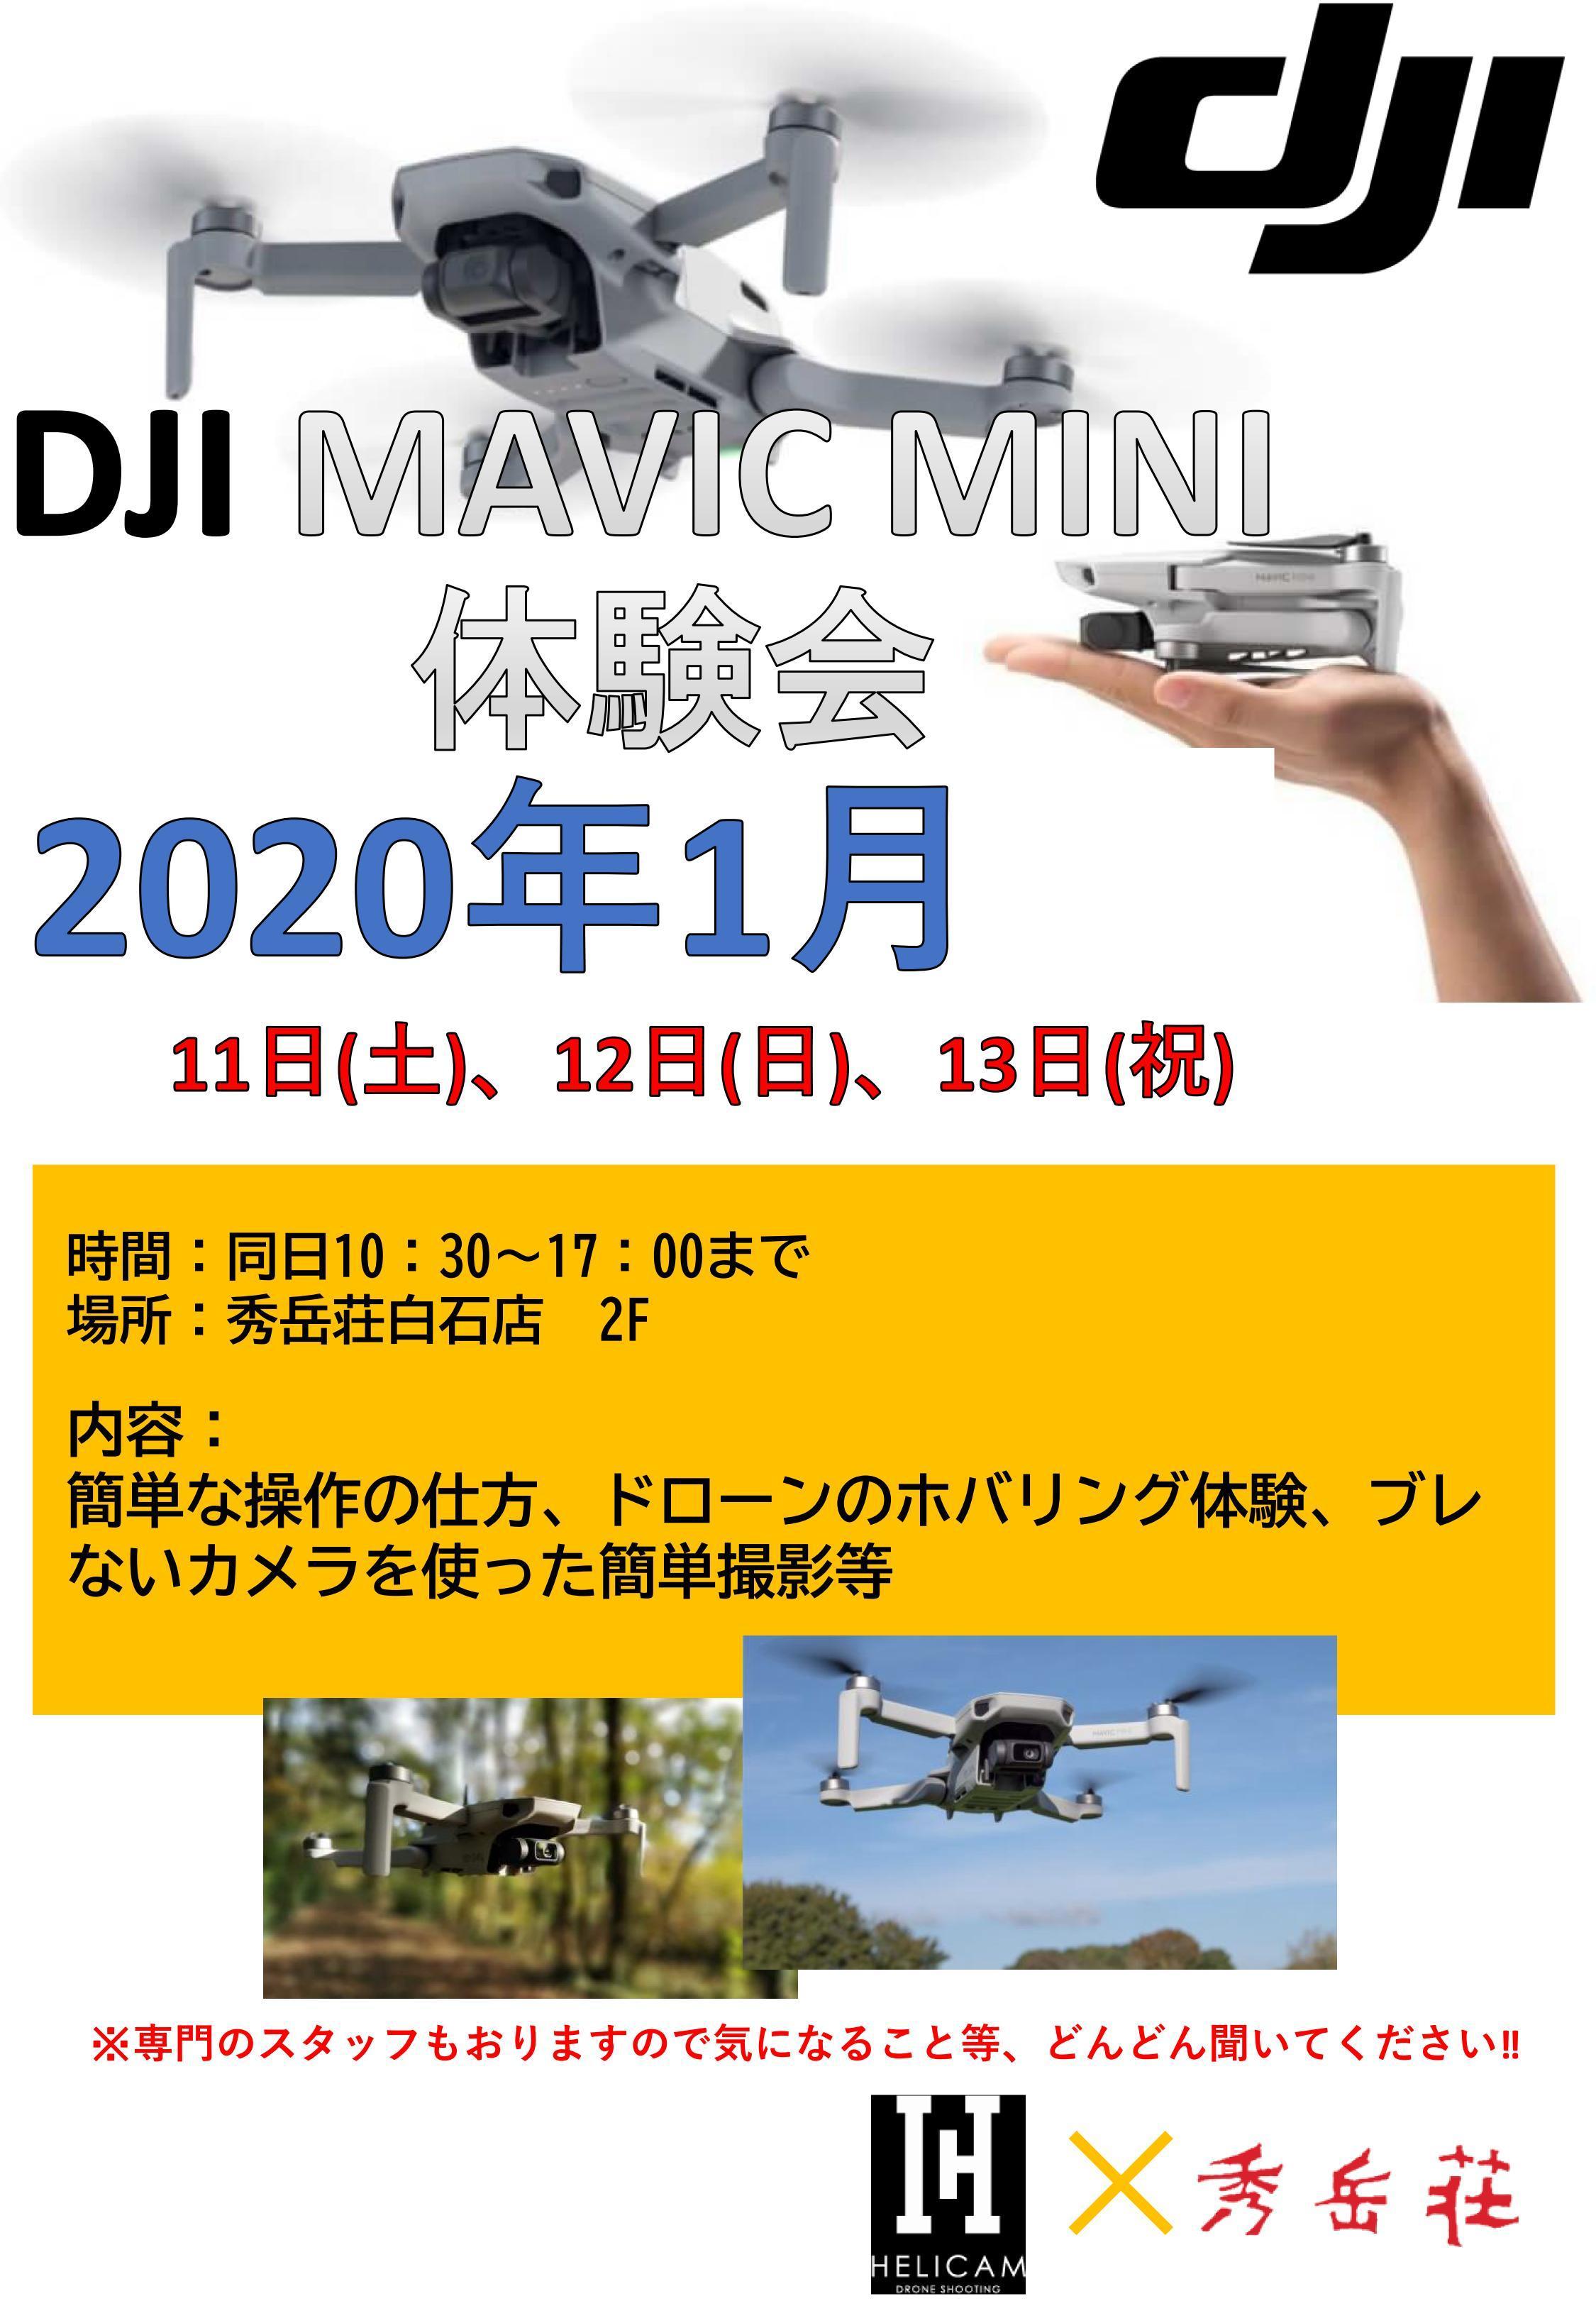 dji MAVIC MINI体験会 時間変更のお知らせ_d0198793_11381077.jpg